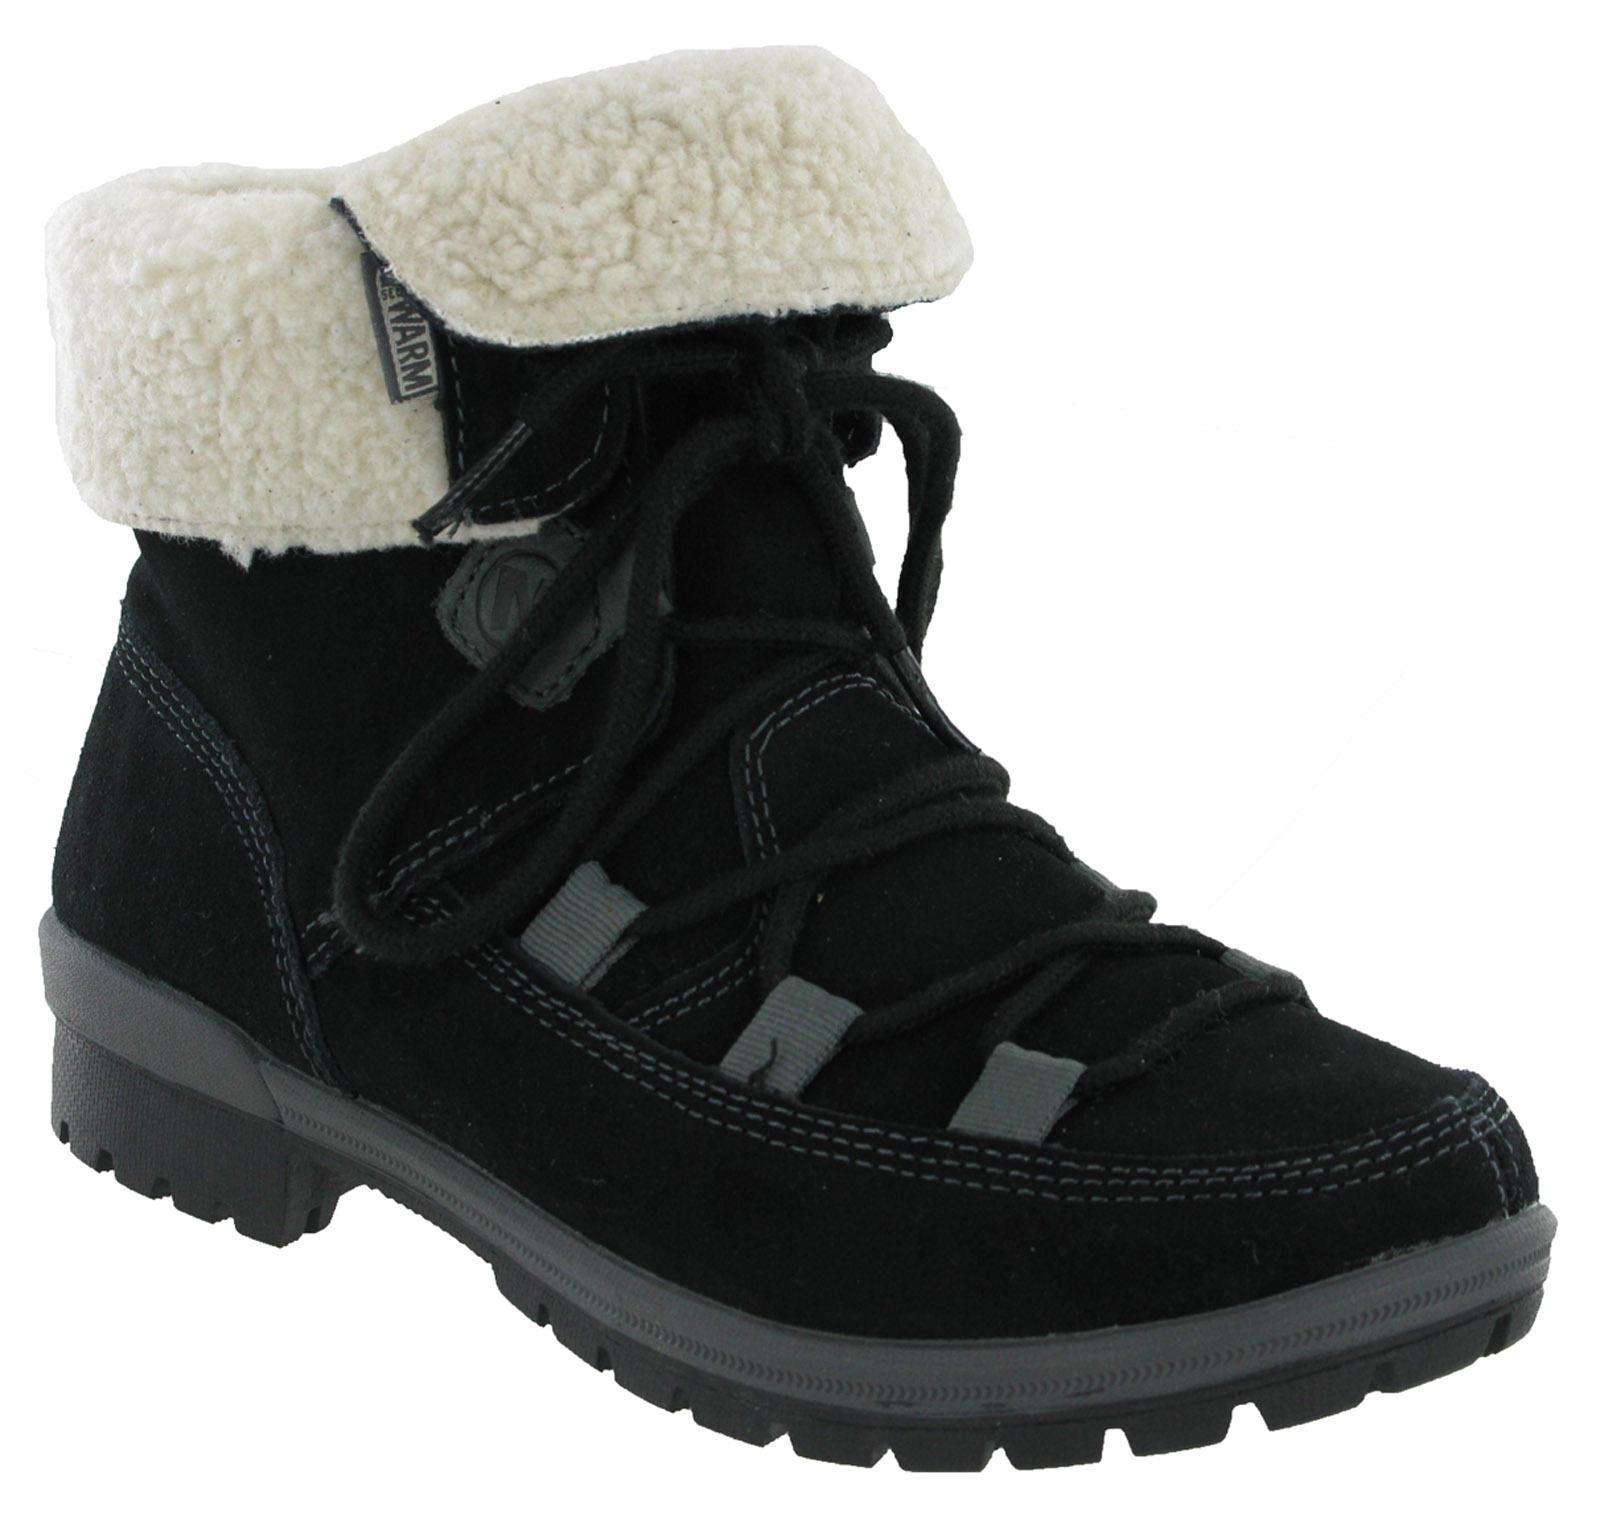 Merrell Esmeril Encaje Cálida Lana Lana Lana Forrada Para Mujer botas al Tobillo Caminar Negro UK3.5-8.5  nueva marca